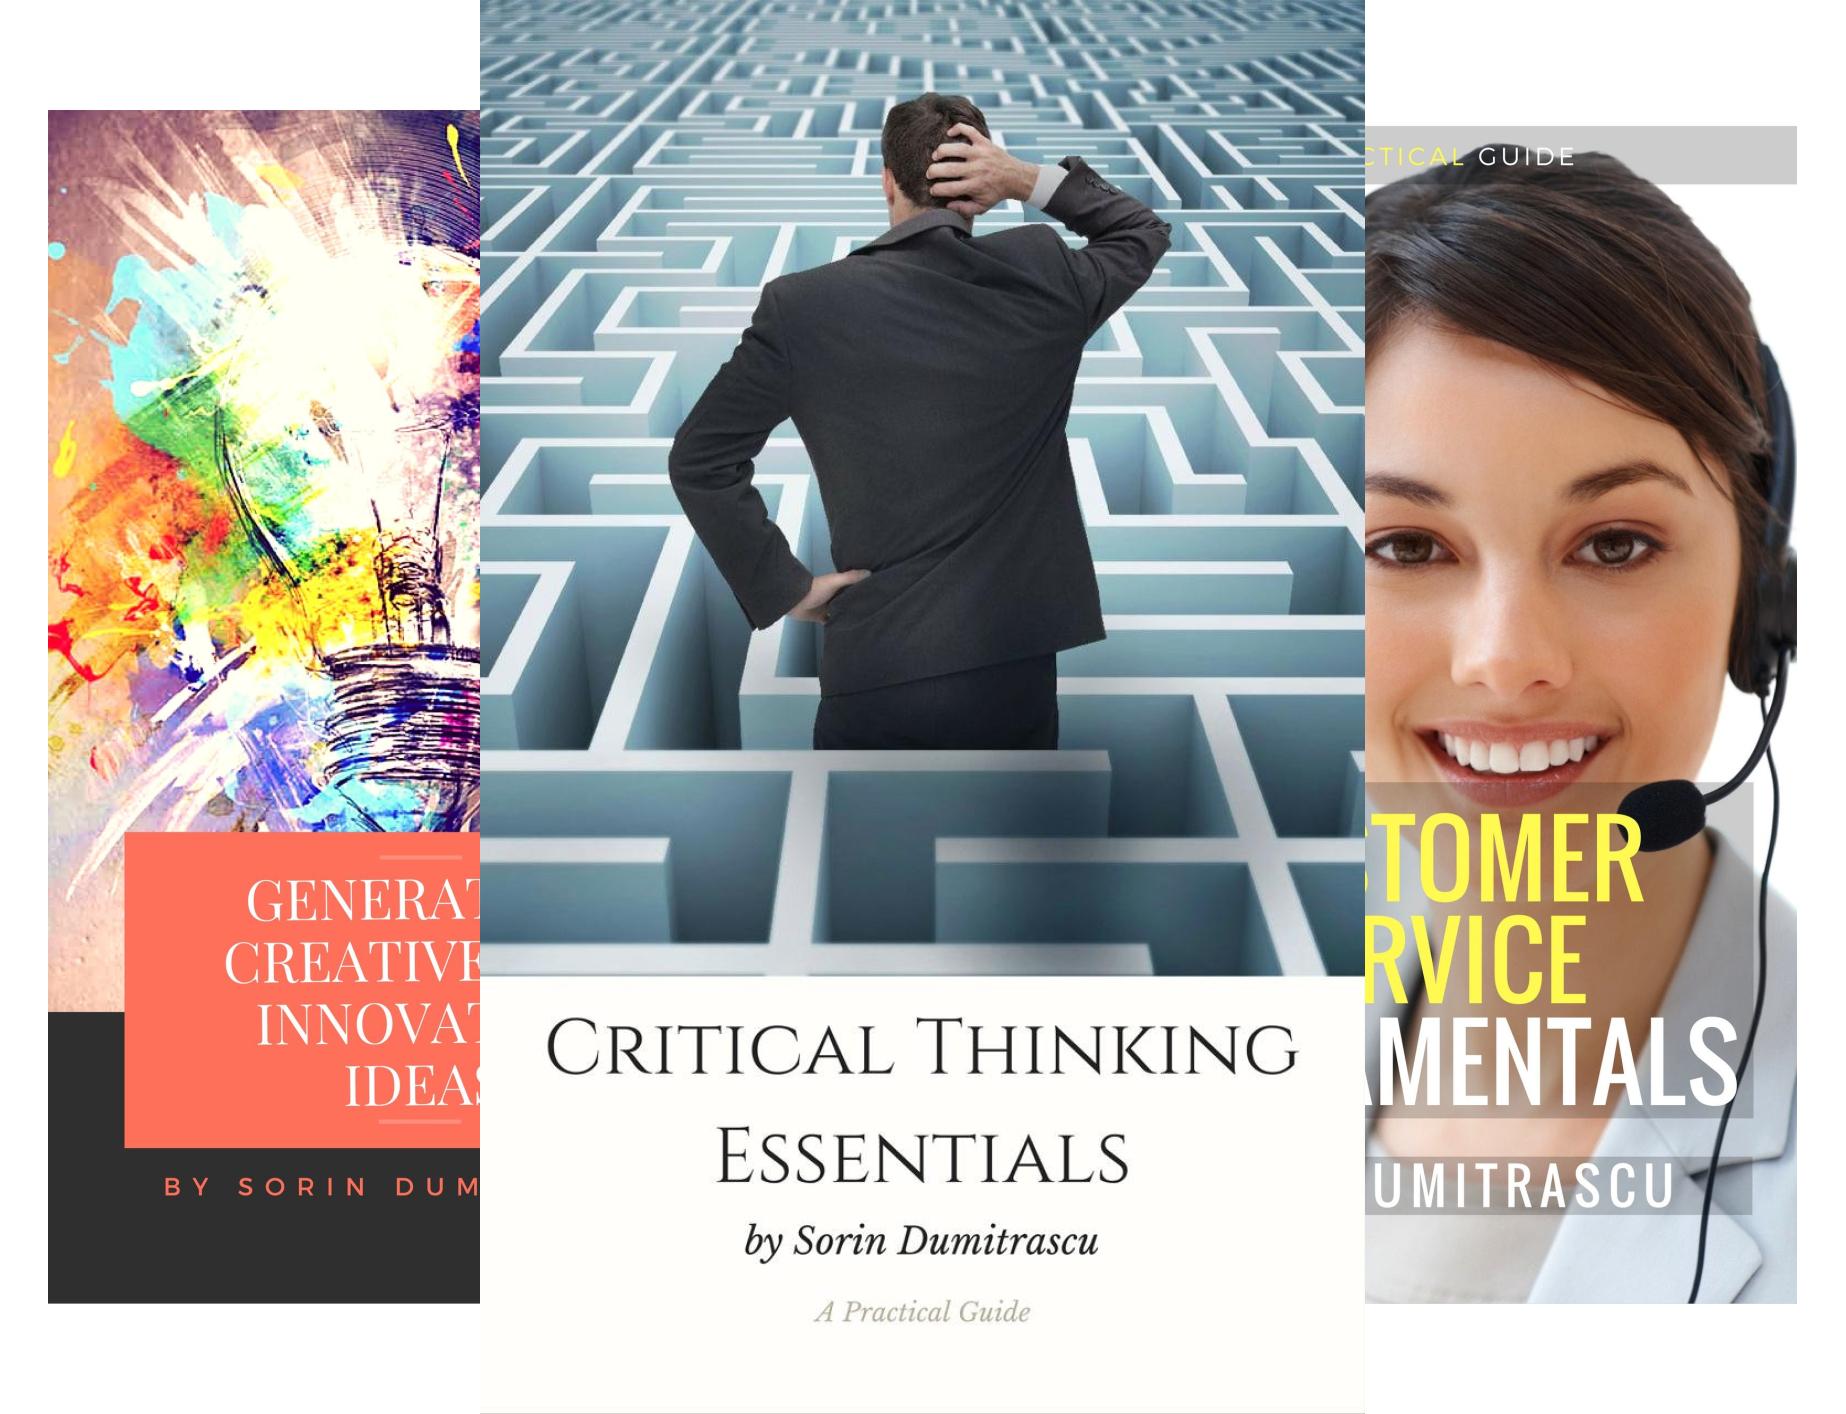 10 ZA DARMO eBooks: Critical Thinking, Creative Innovative Ideas, Customer Service, Portfolio Management, Presentation Skill etc - Amazon US